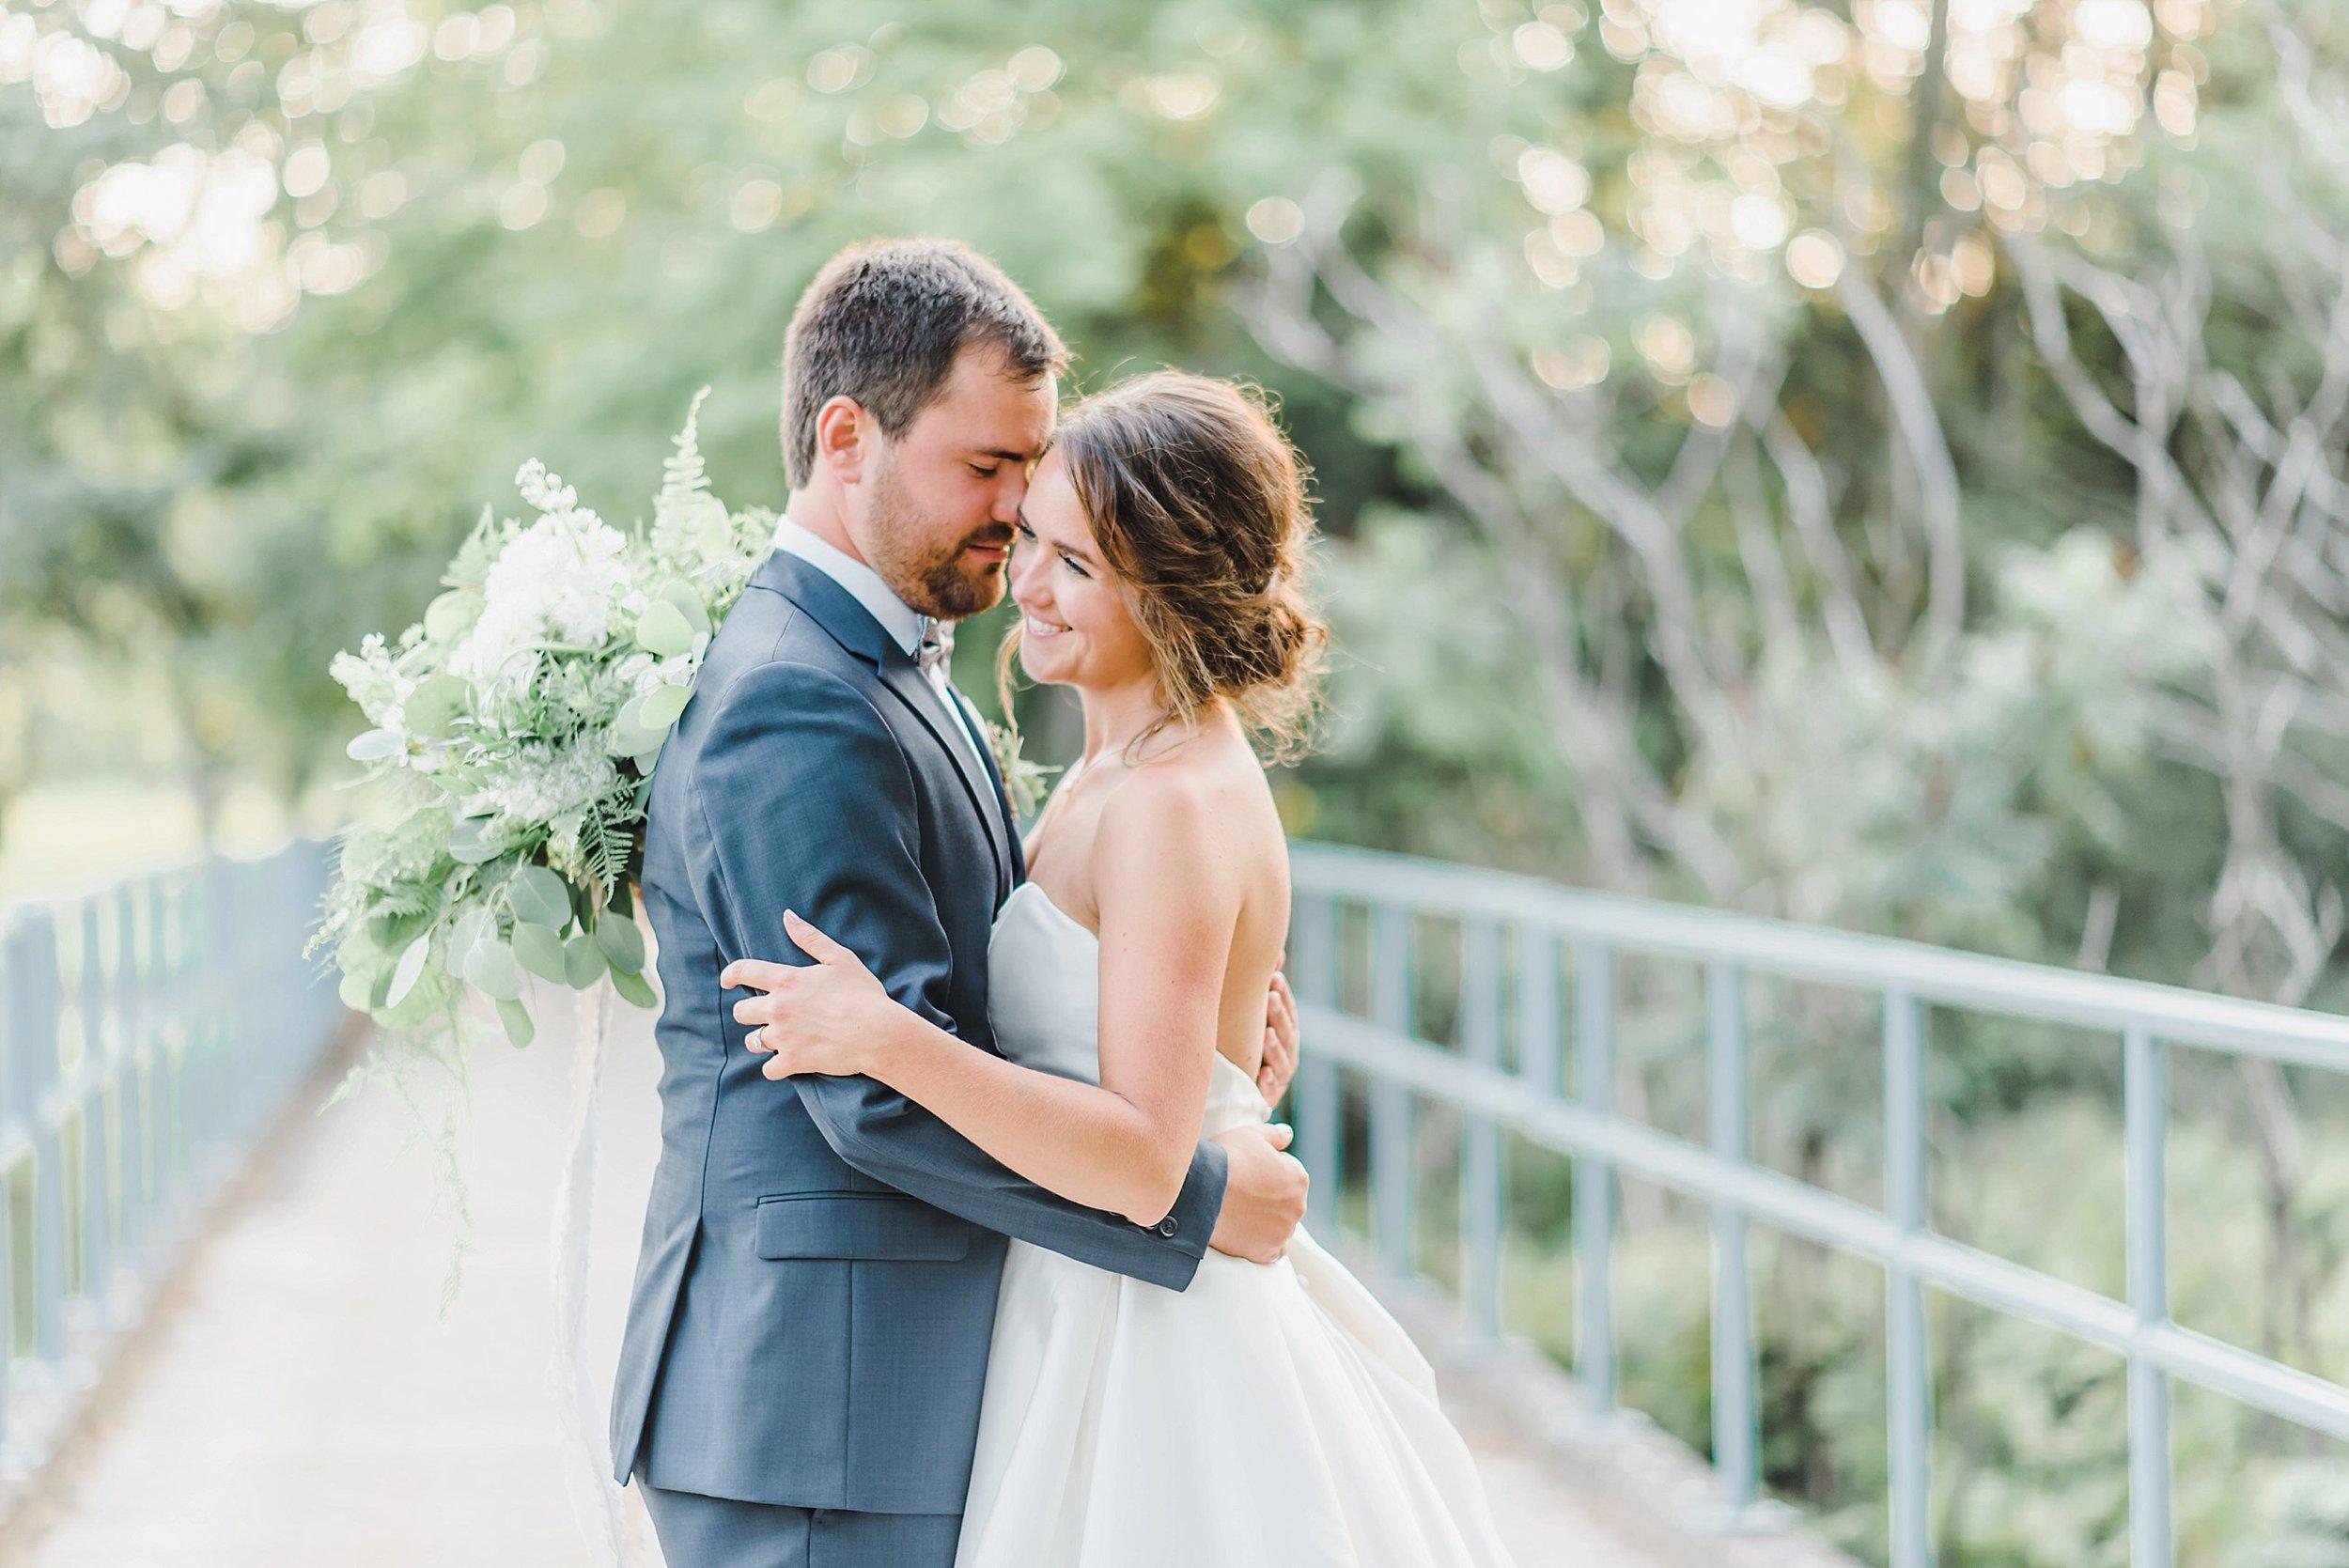 light airy indie fine art ottawa wedding photographer | Ali and Batoul Photography_0567.jpg